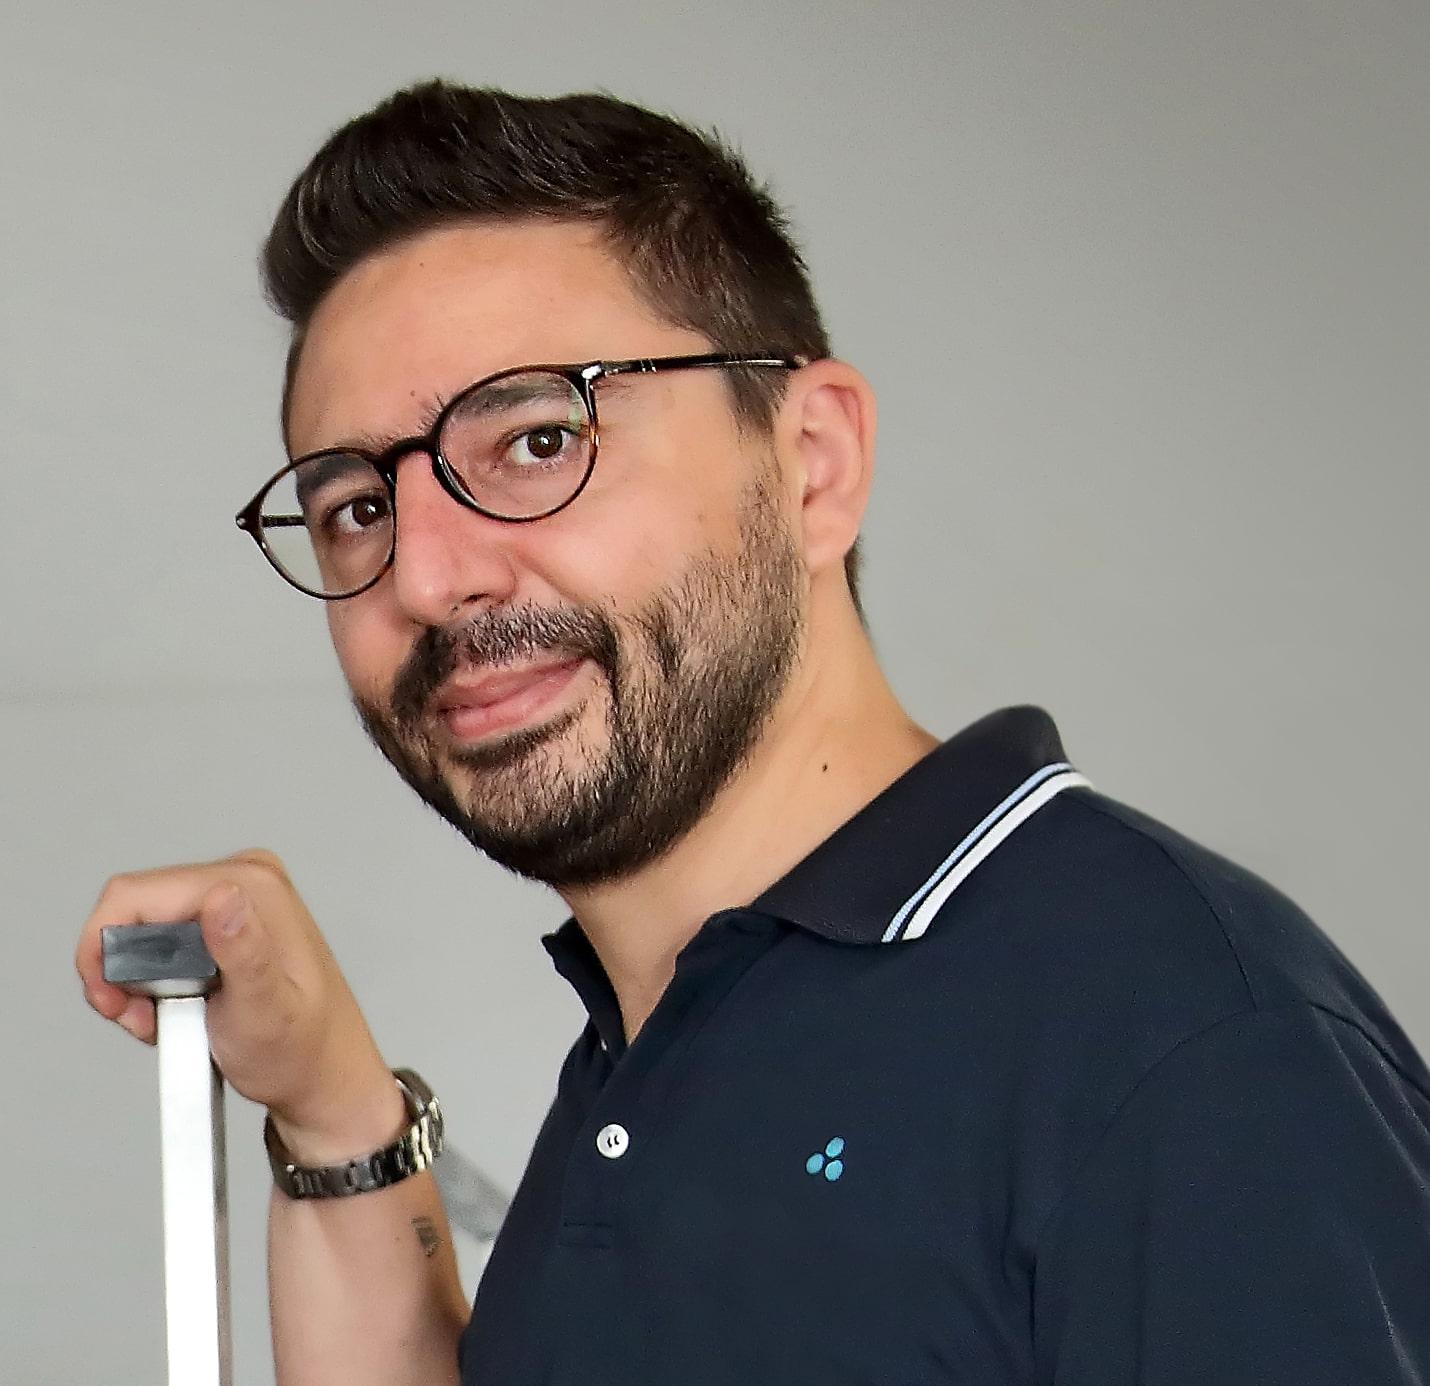 Daniele scivoli fondatore amaro gerlando